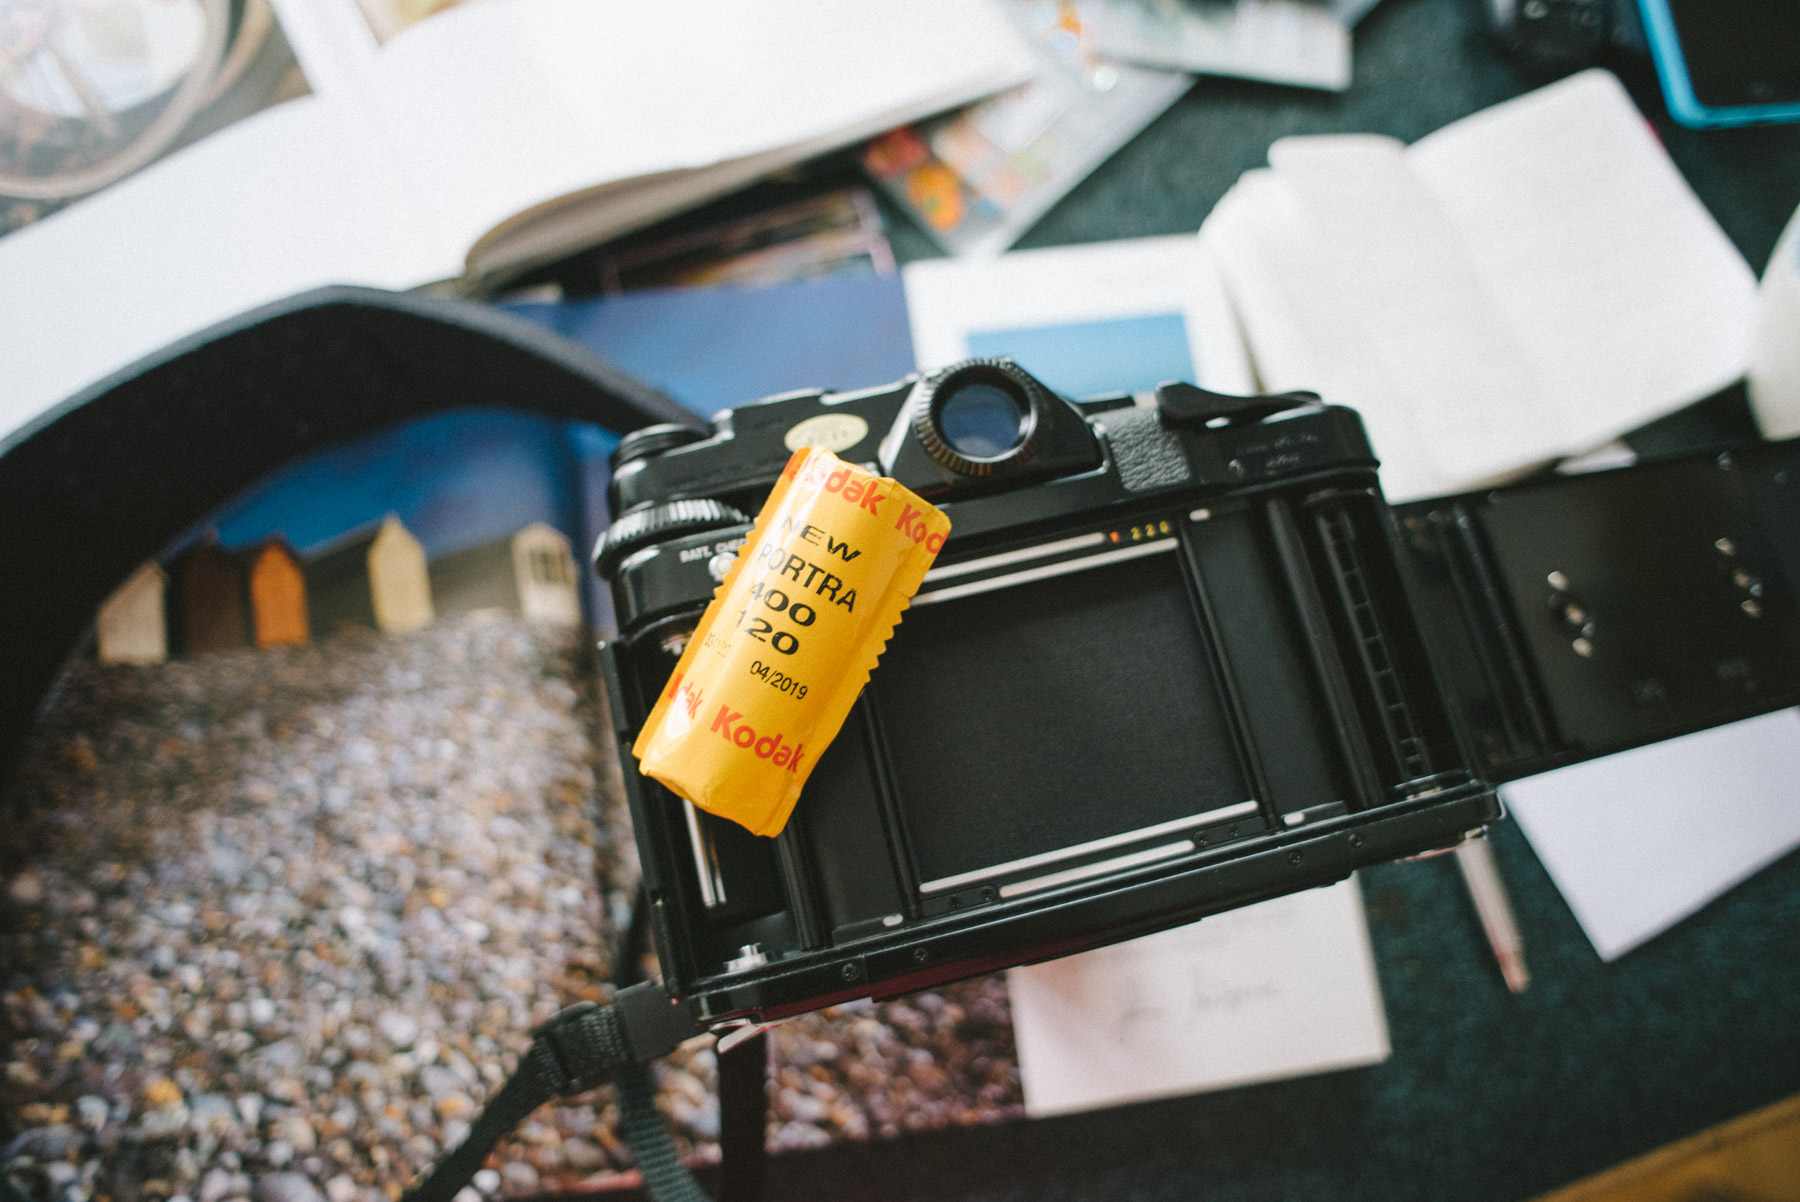 Kodak New Portra 400 medium format film roll ready to be loaded into my Pentax 6x7